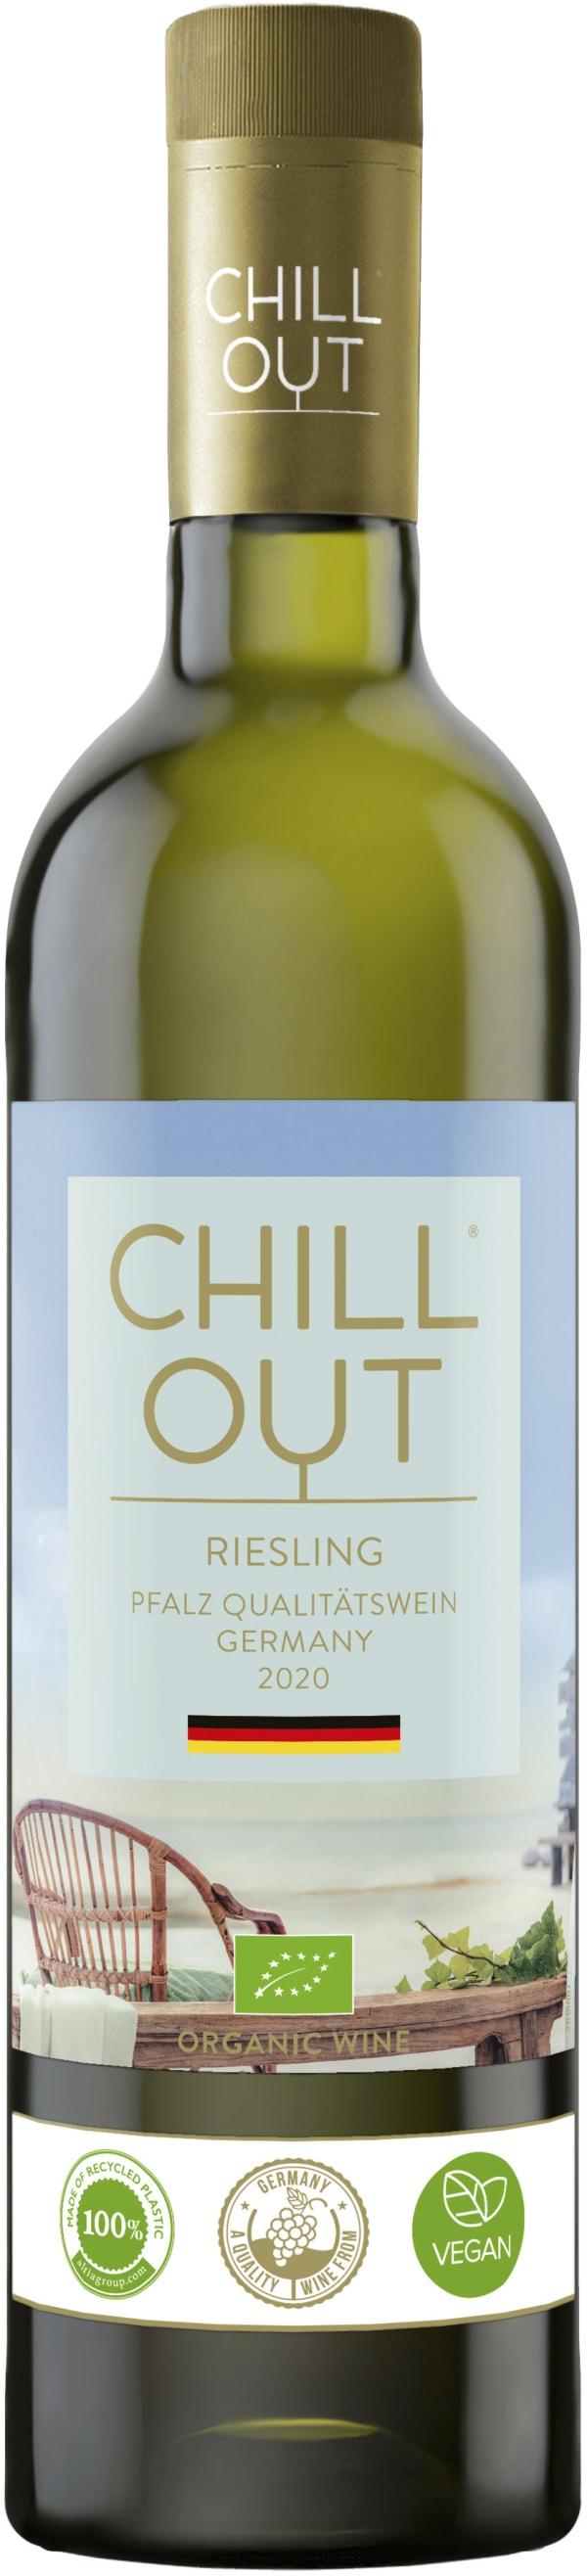 Chill Out Crisp & Fruity Riesling Organic 2015 plastflaska